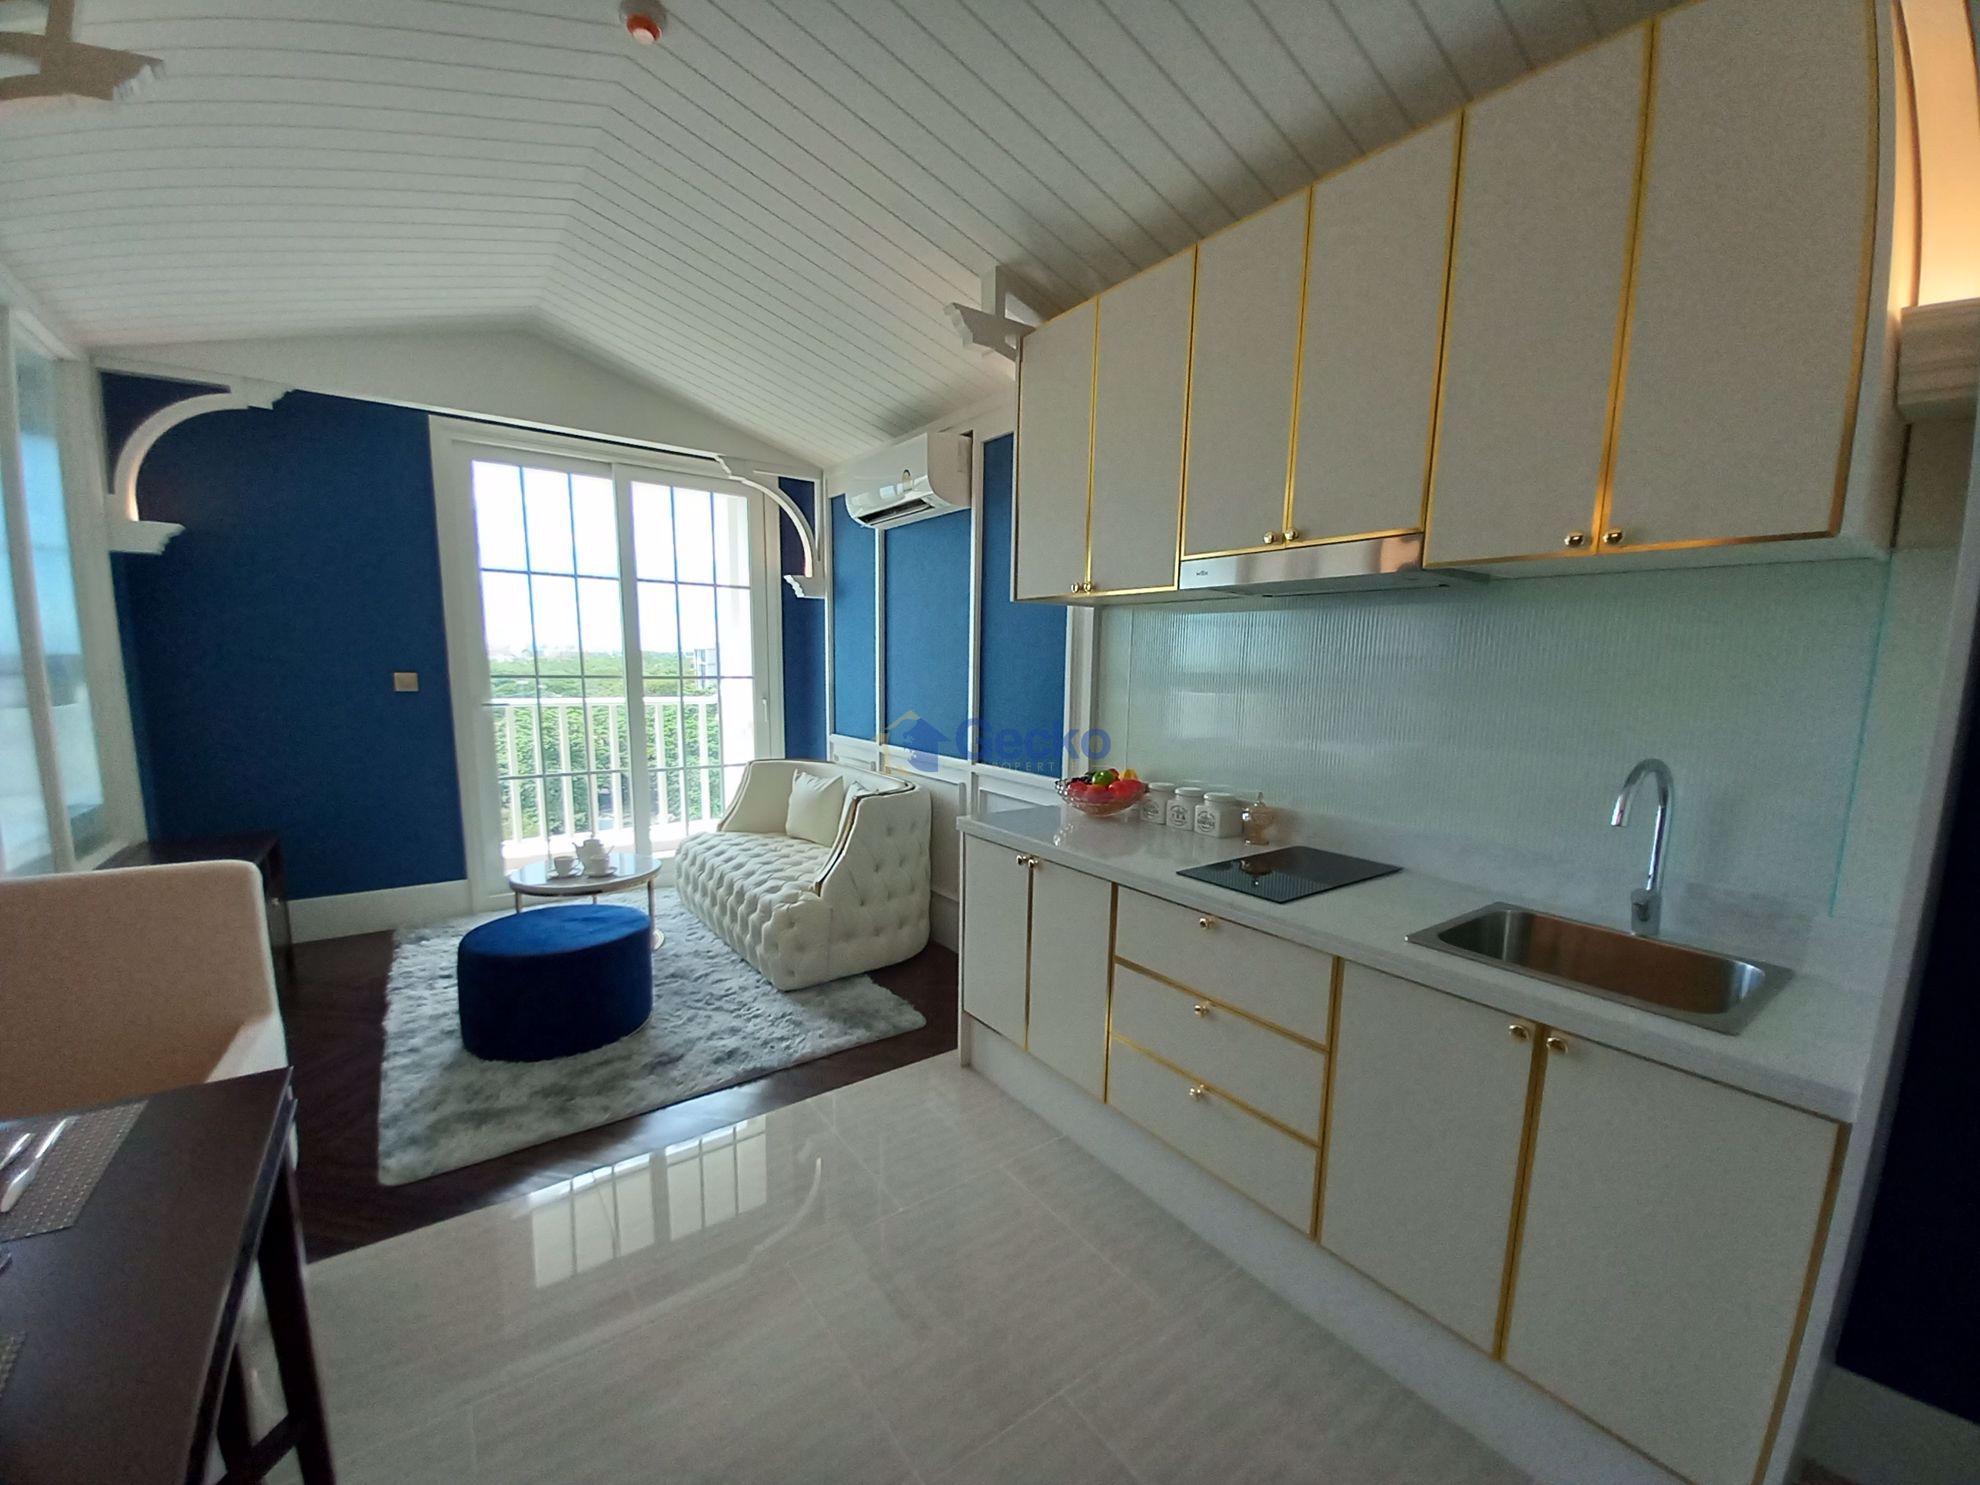 Picture of 1  Bedroom bed in Condo in Grand Florida Beachfront Condo Resort in Na Jomtien C009277